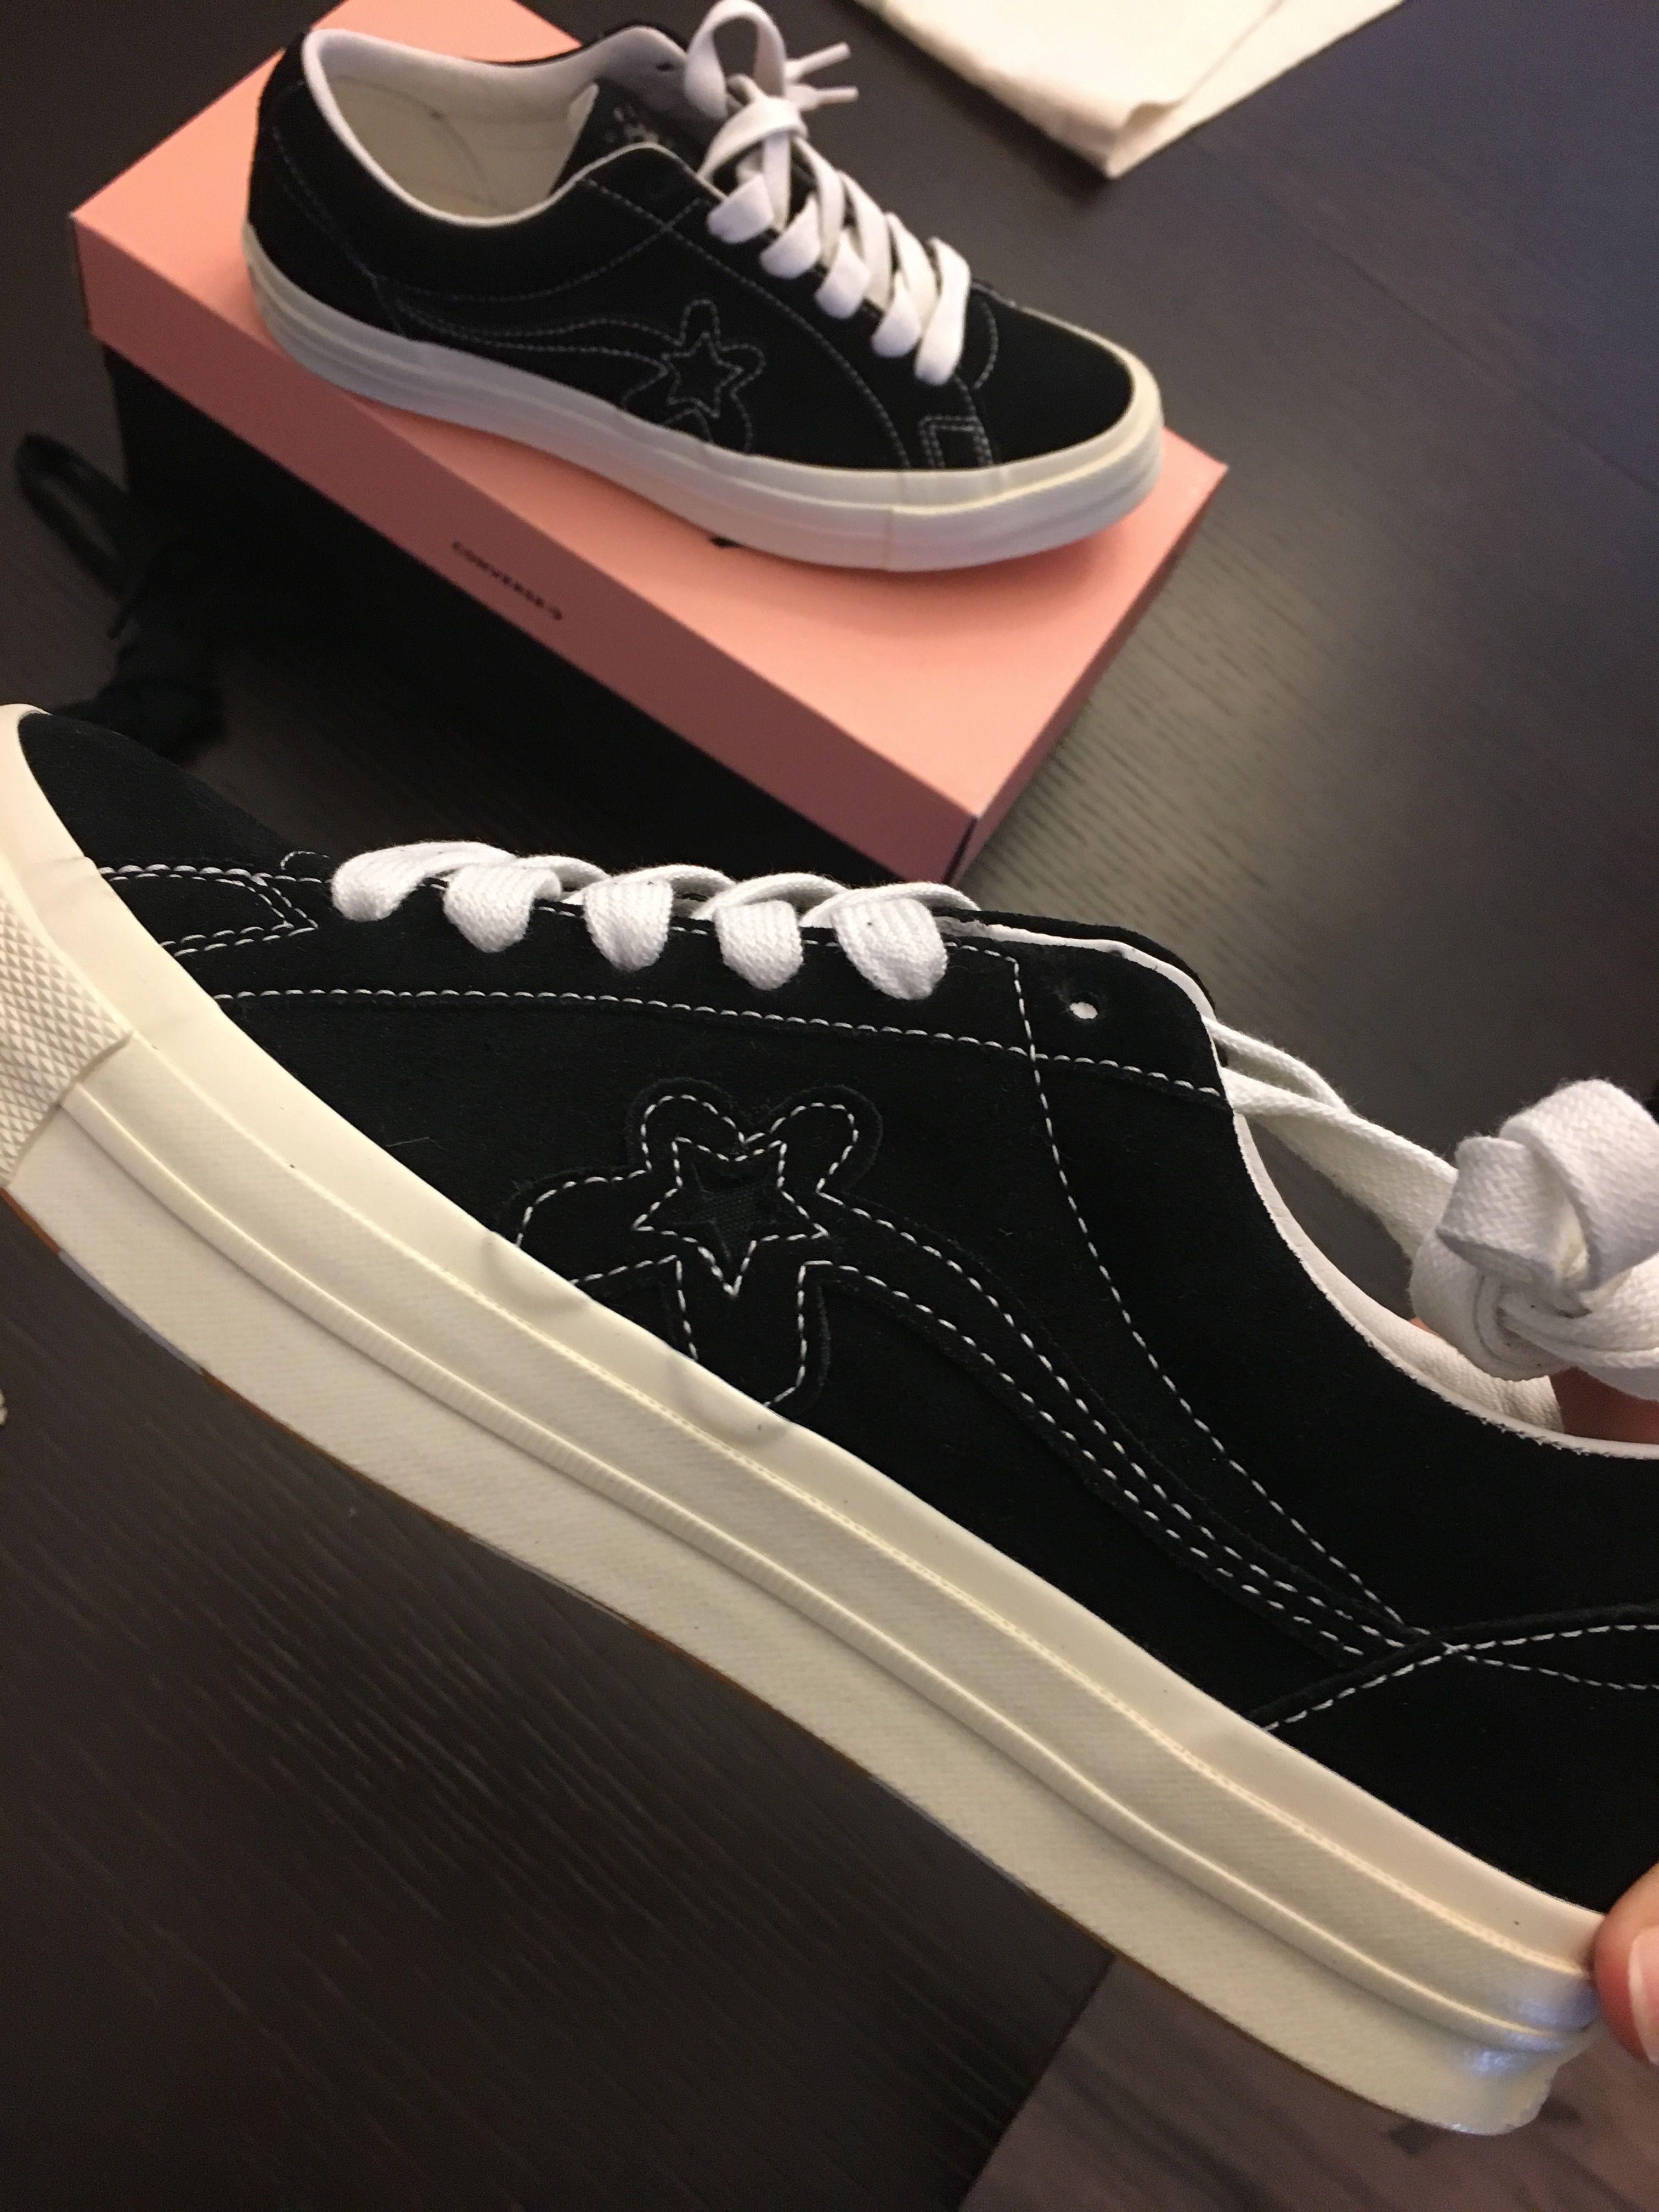 42+ Converse golf le fleur shoes ideas ideas in 2021